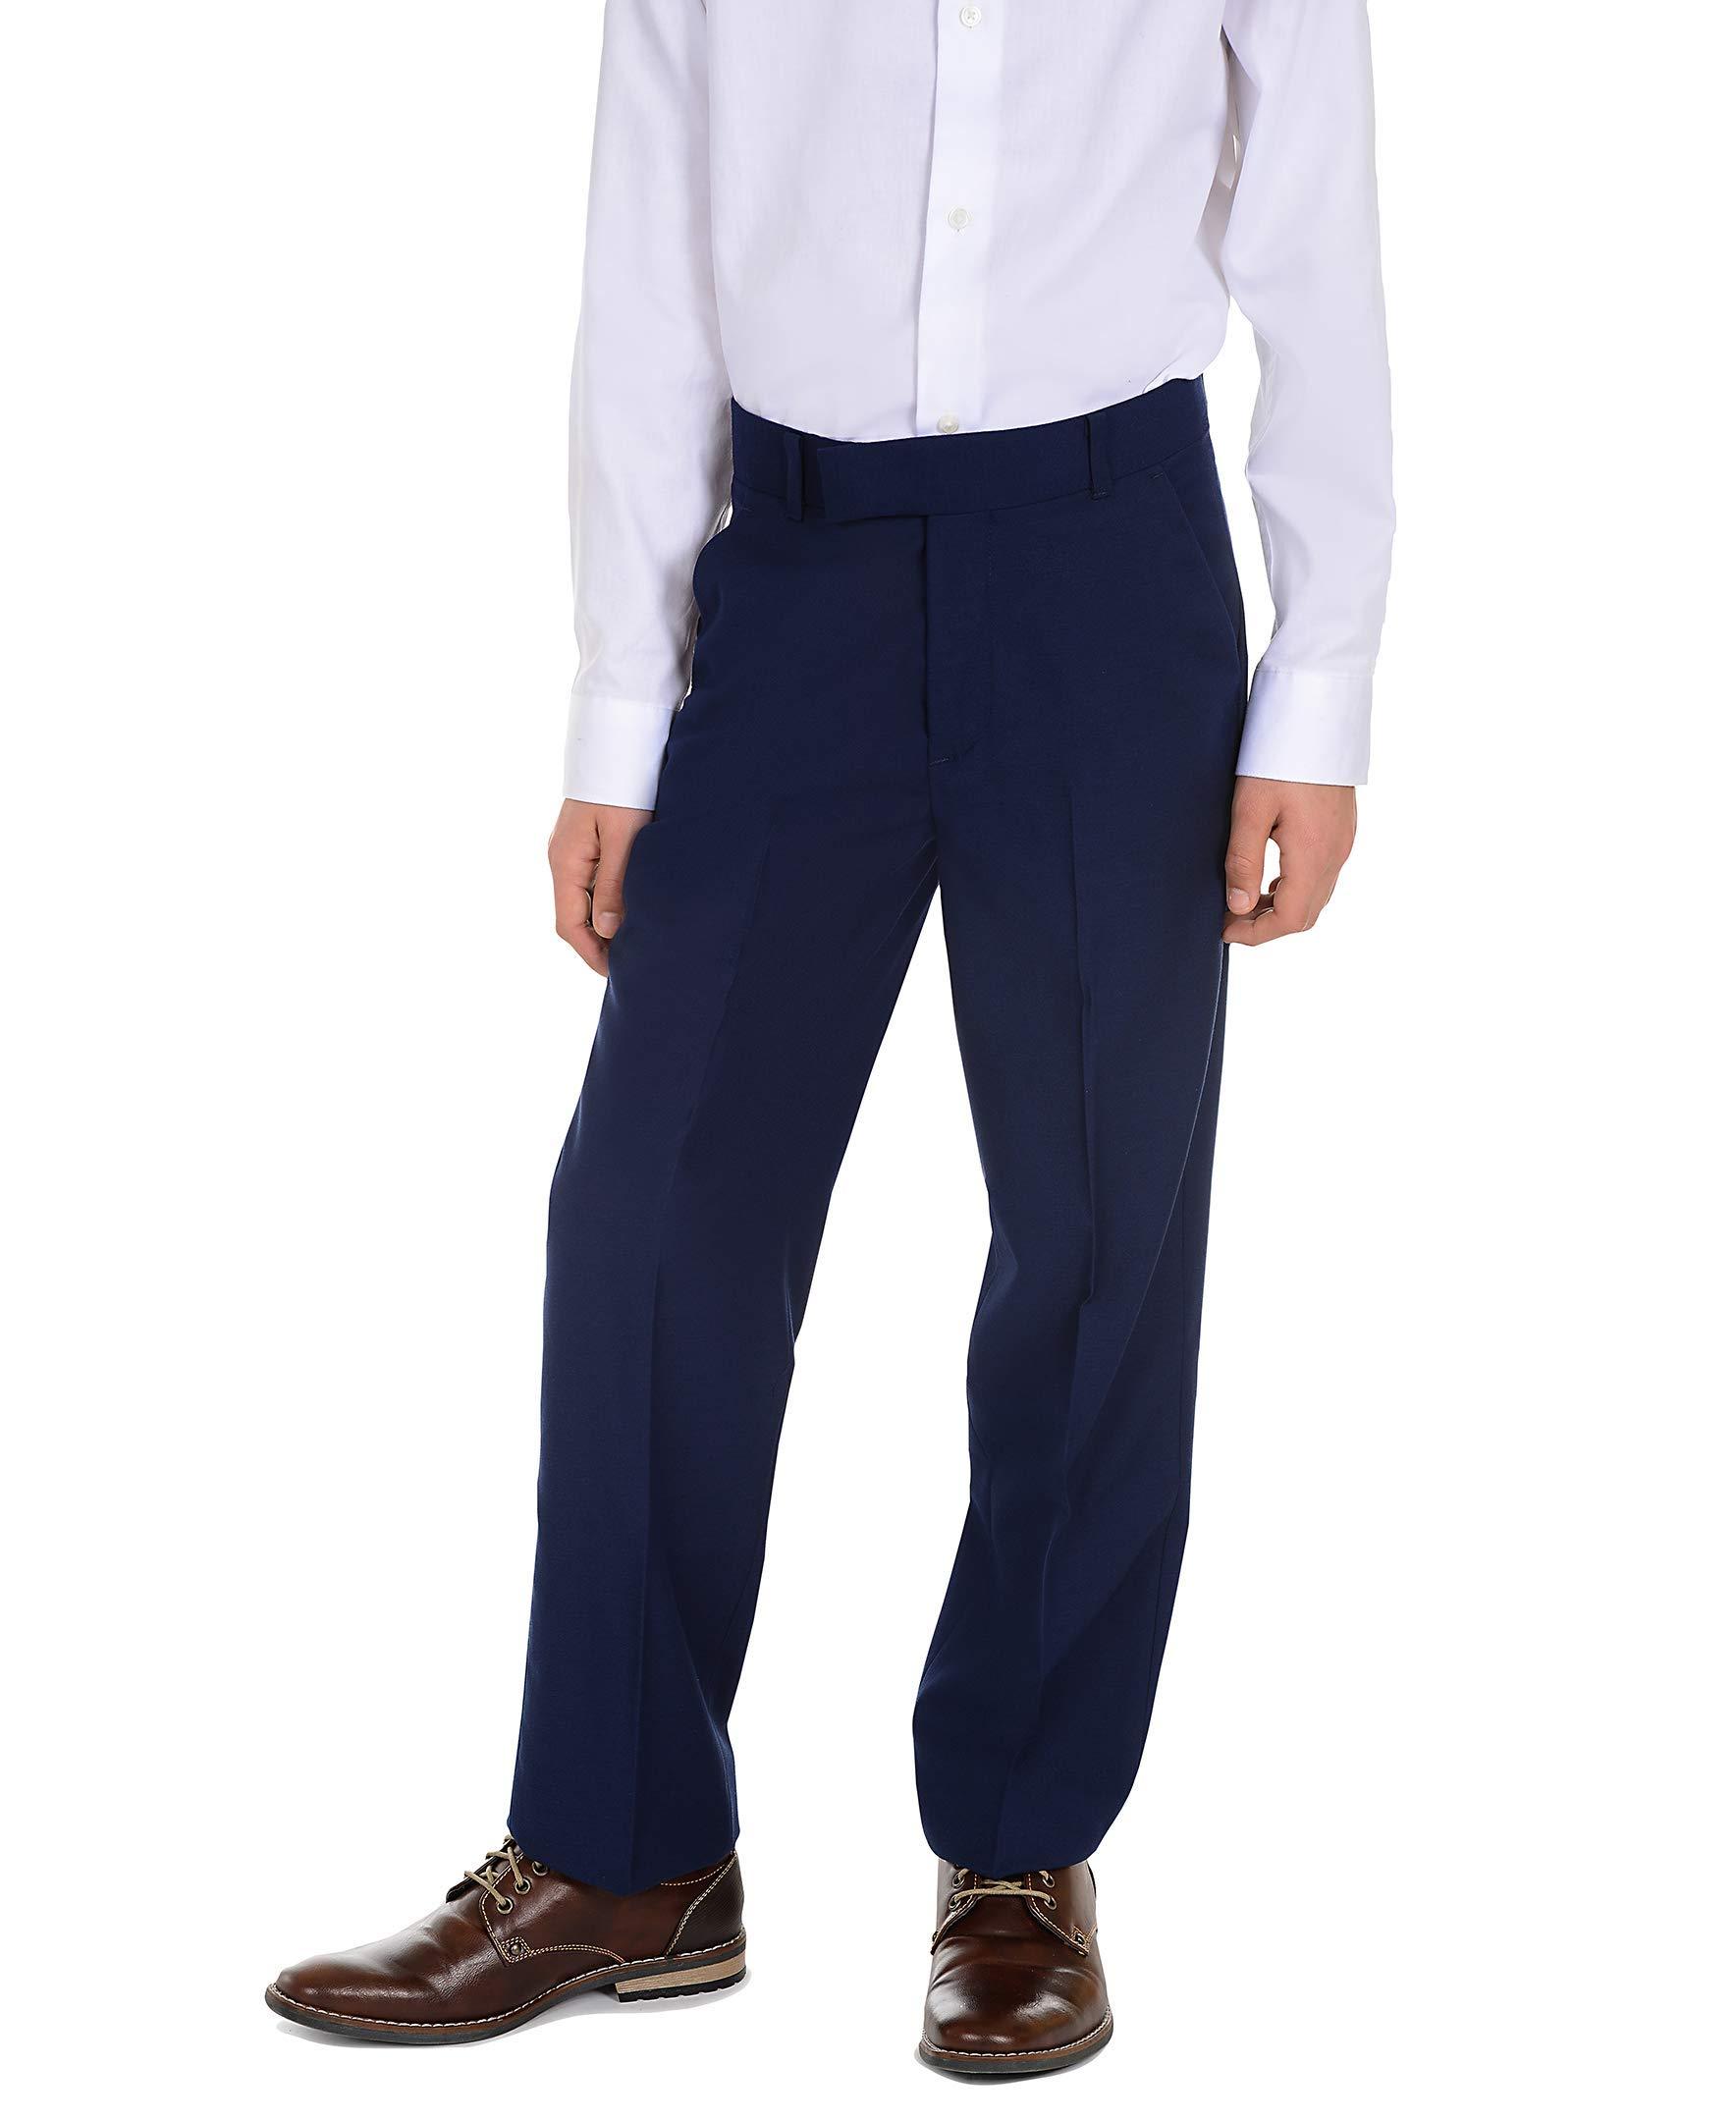 Calvin Klein Big Boys' Flat Front Dress Pant, Infinite Blue, 10 by Calvin Klein (Image #4)